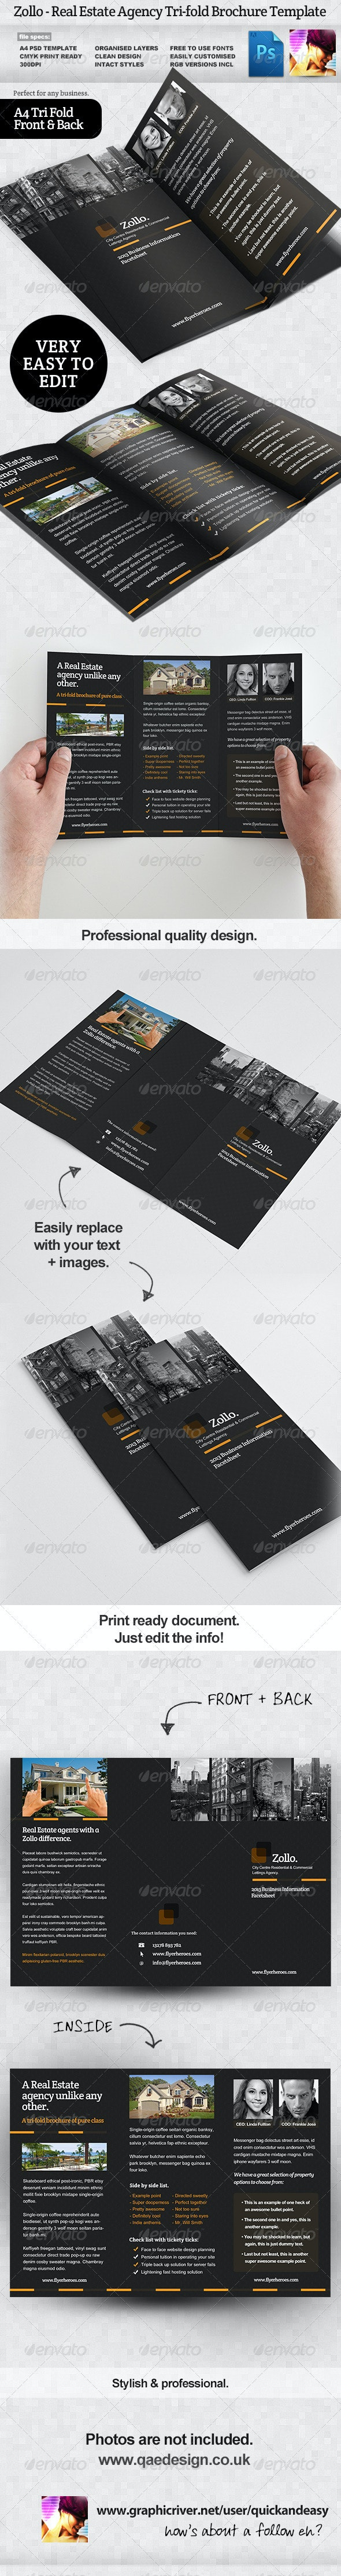 Zollo Real Estate Tri Fold Brochure Template - Corporate Brochures